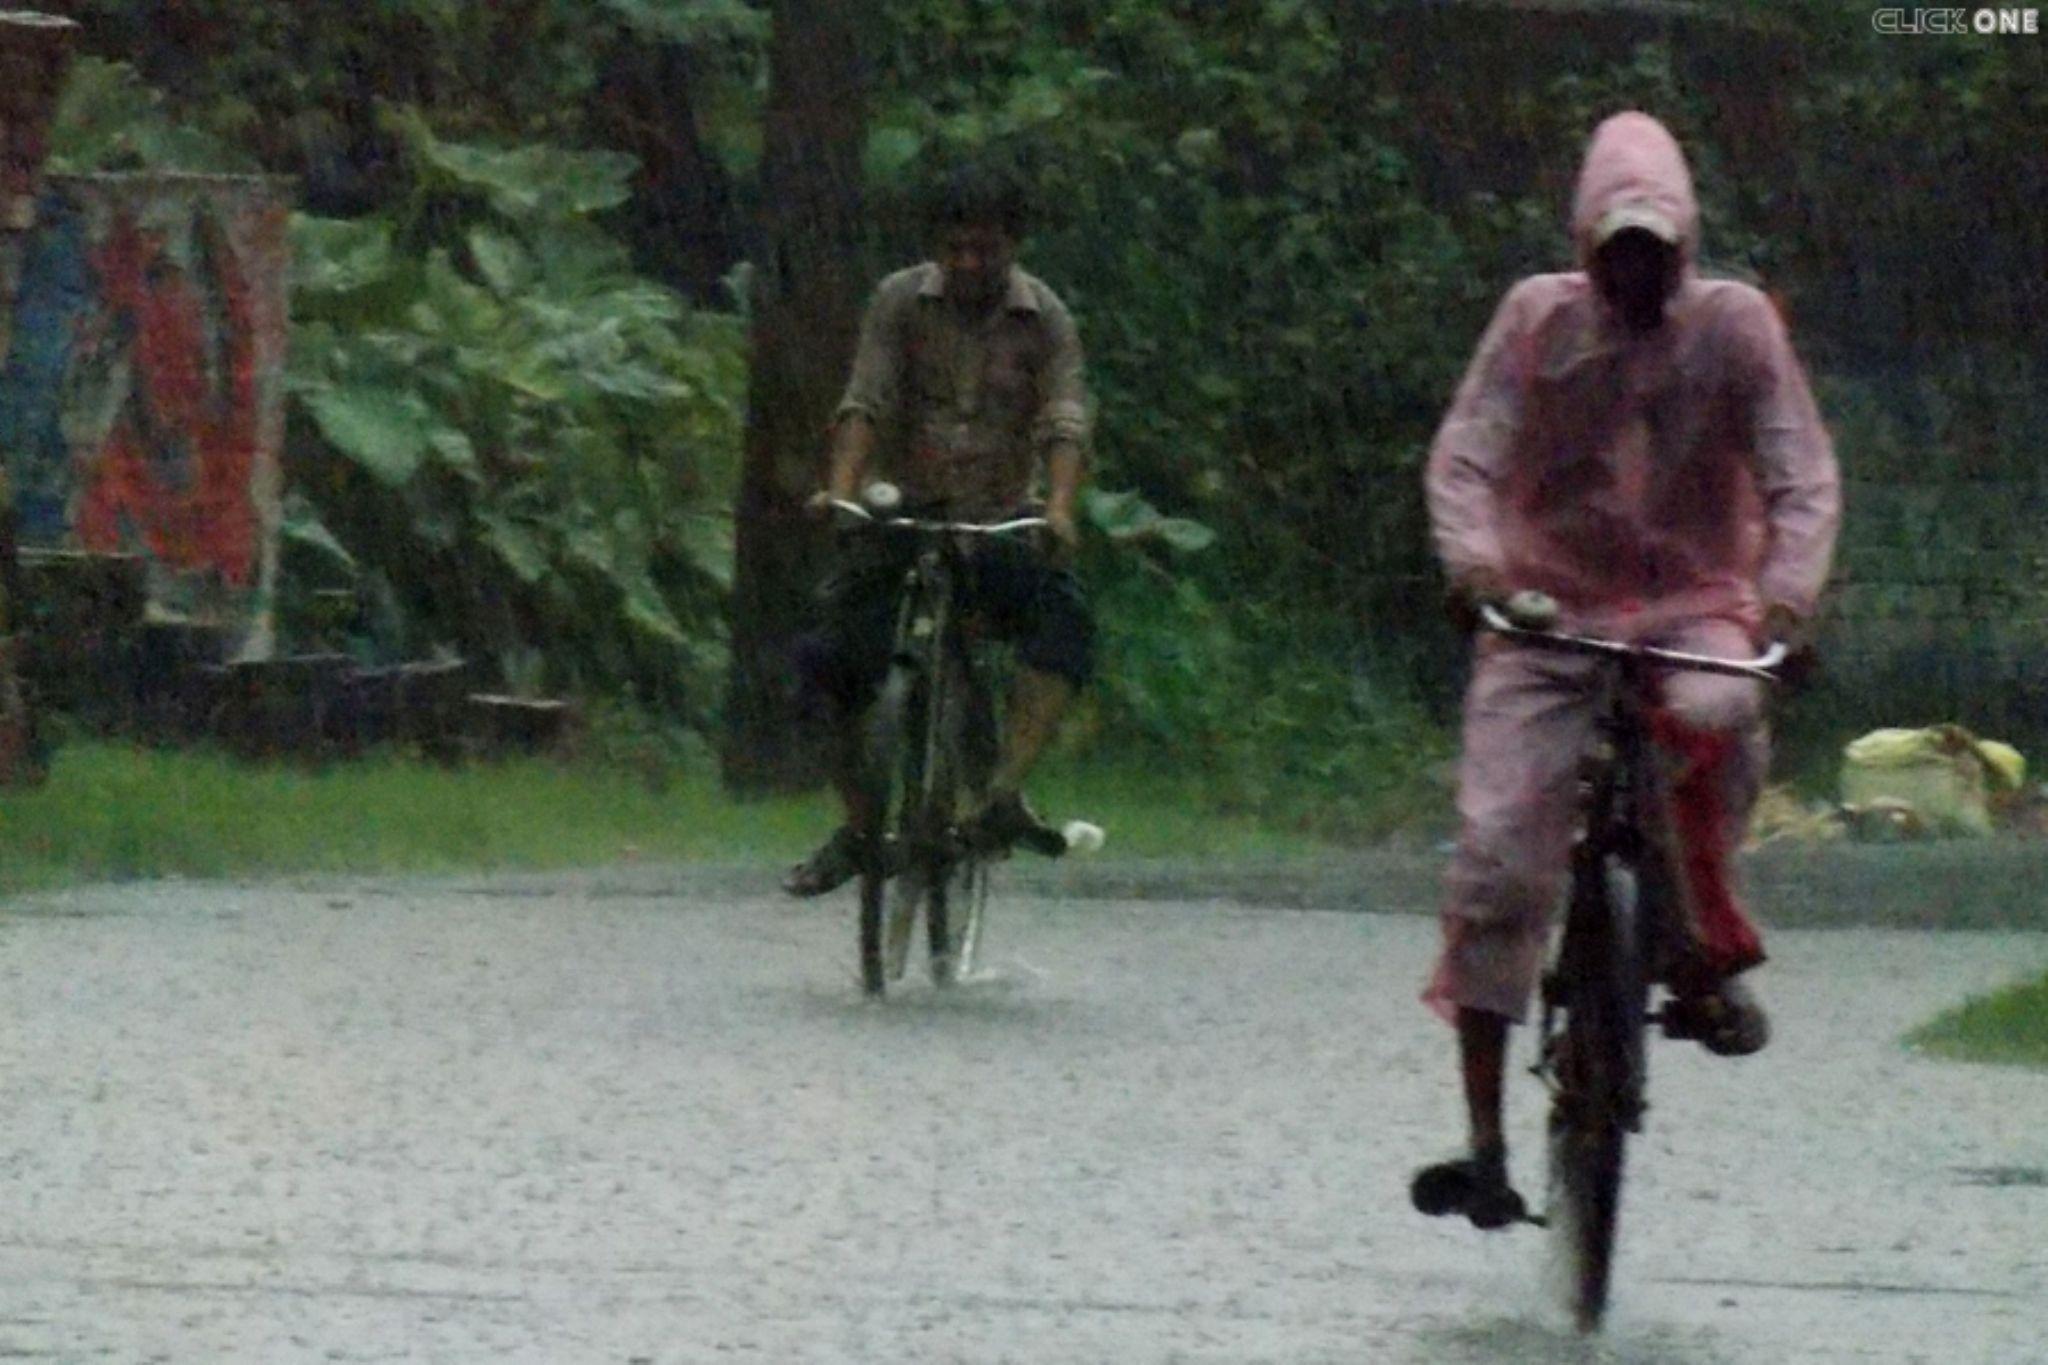 Rain by Ăjȫy Ðhâŕ